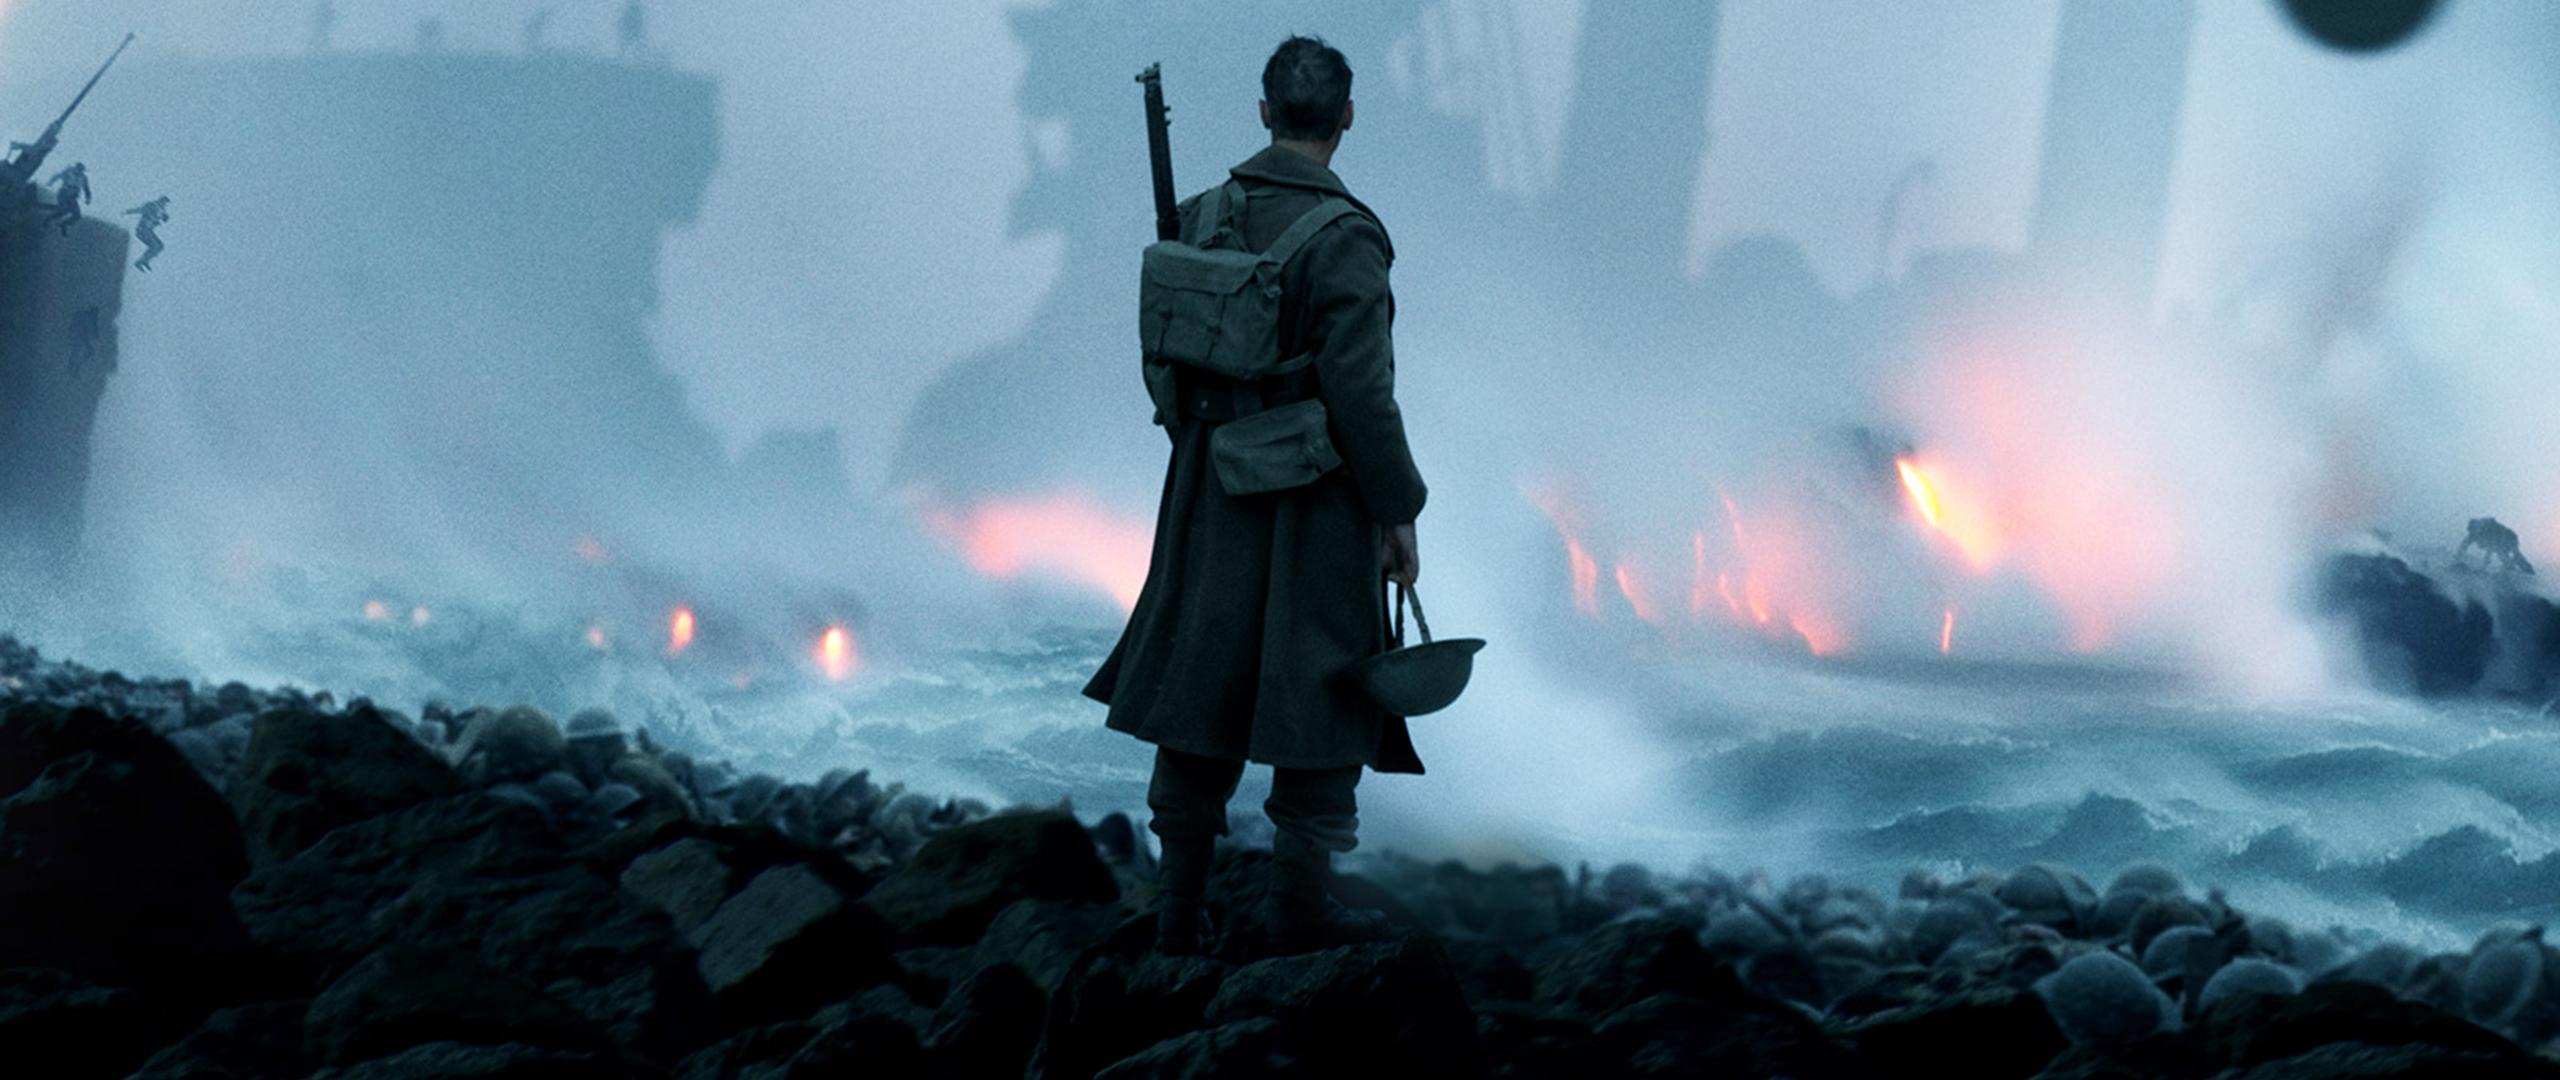 Dunkirk Movie Poster Full Hd 2k Wallpaper